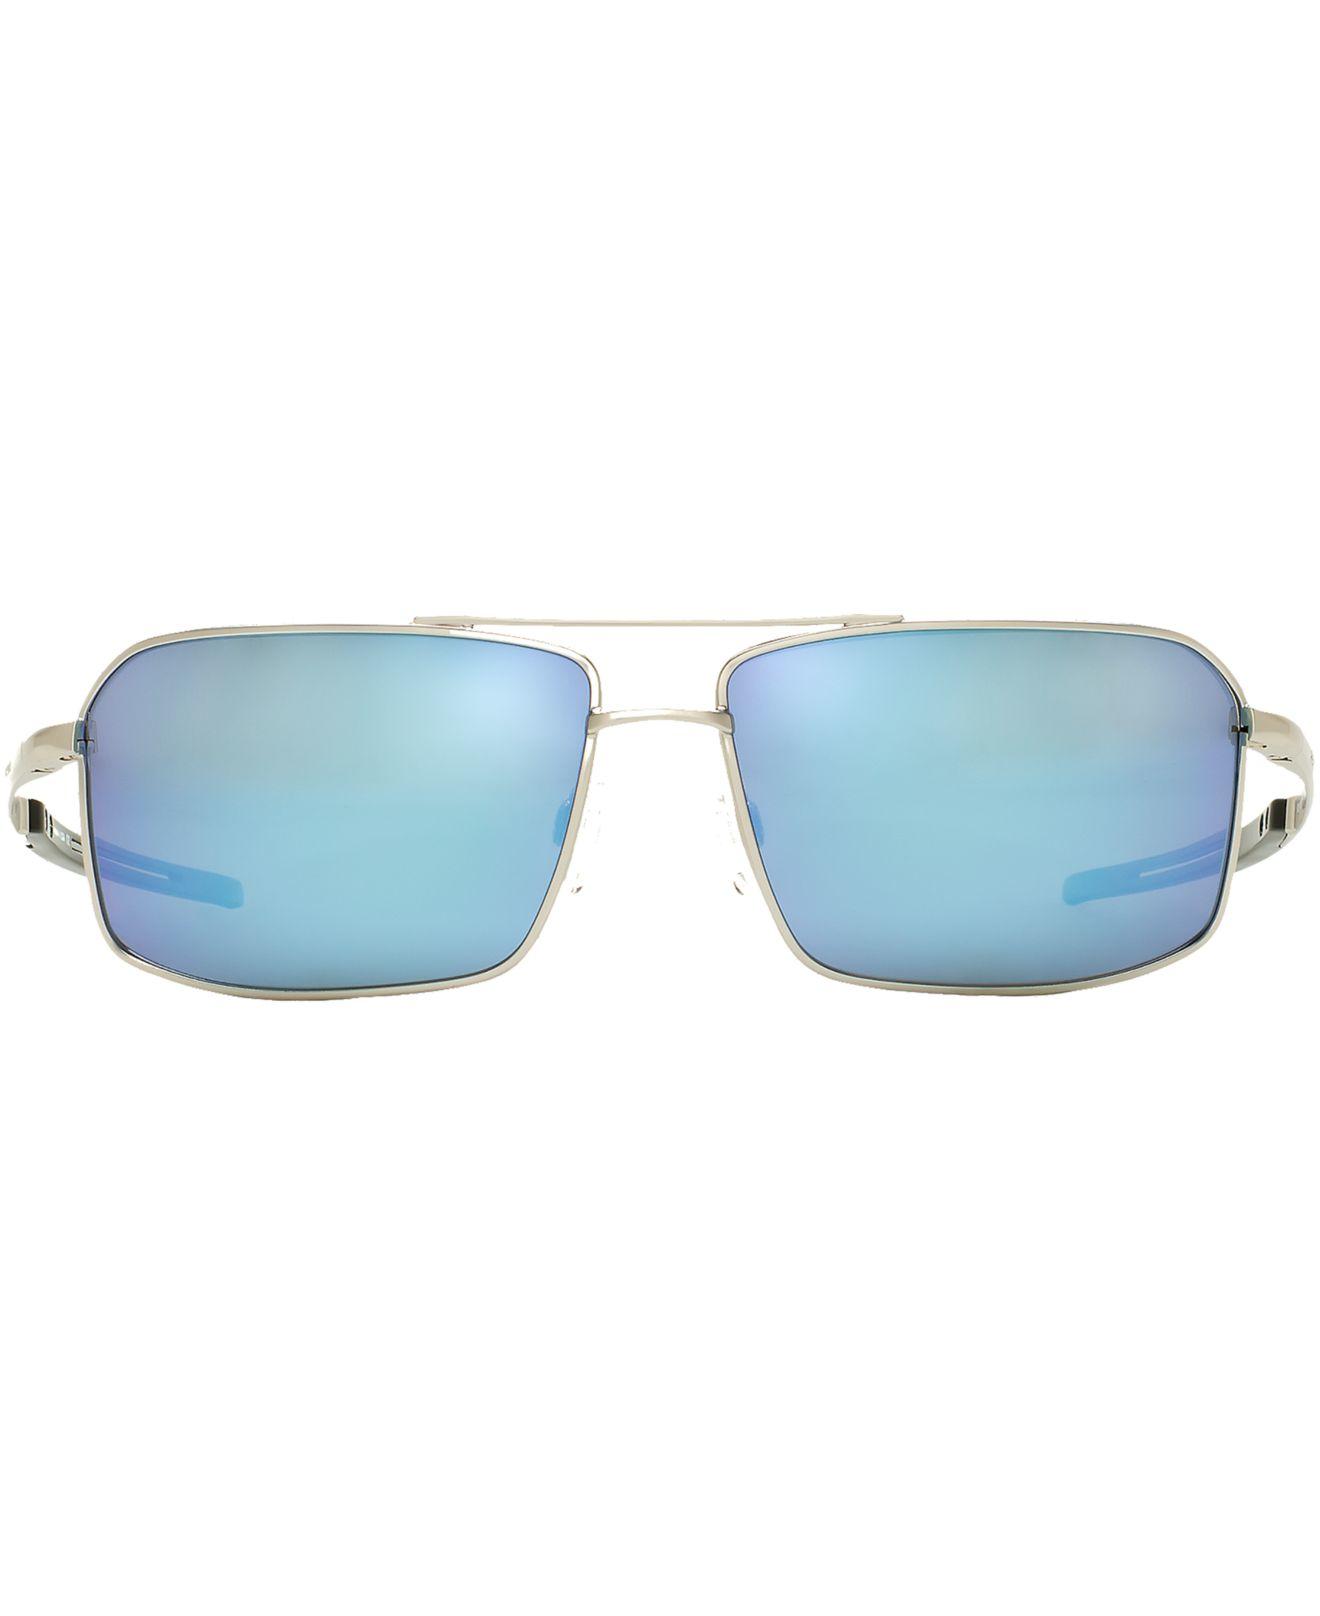 4a567a5ed5 Lyst - Revo Re5001x Cayo X in Blue for Men